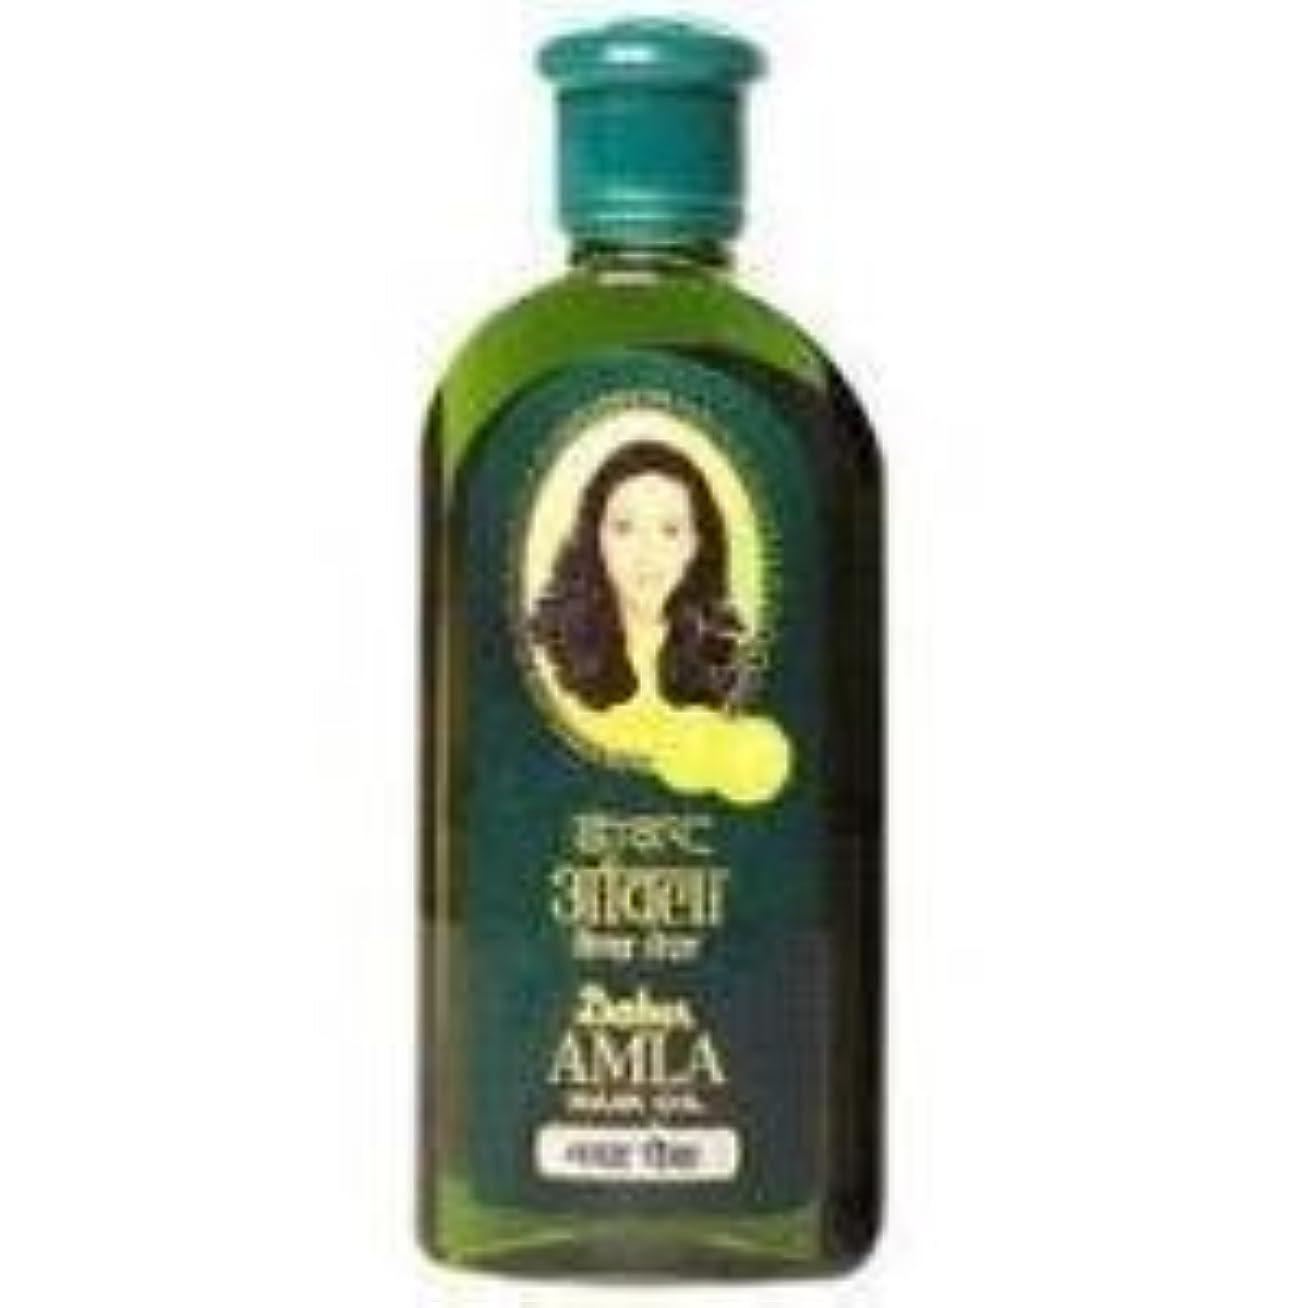 写真を撮る反抗温度計Dabur Amla Hair Oil, 500 ml Bottle by Dabur [並行輸入品]